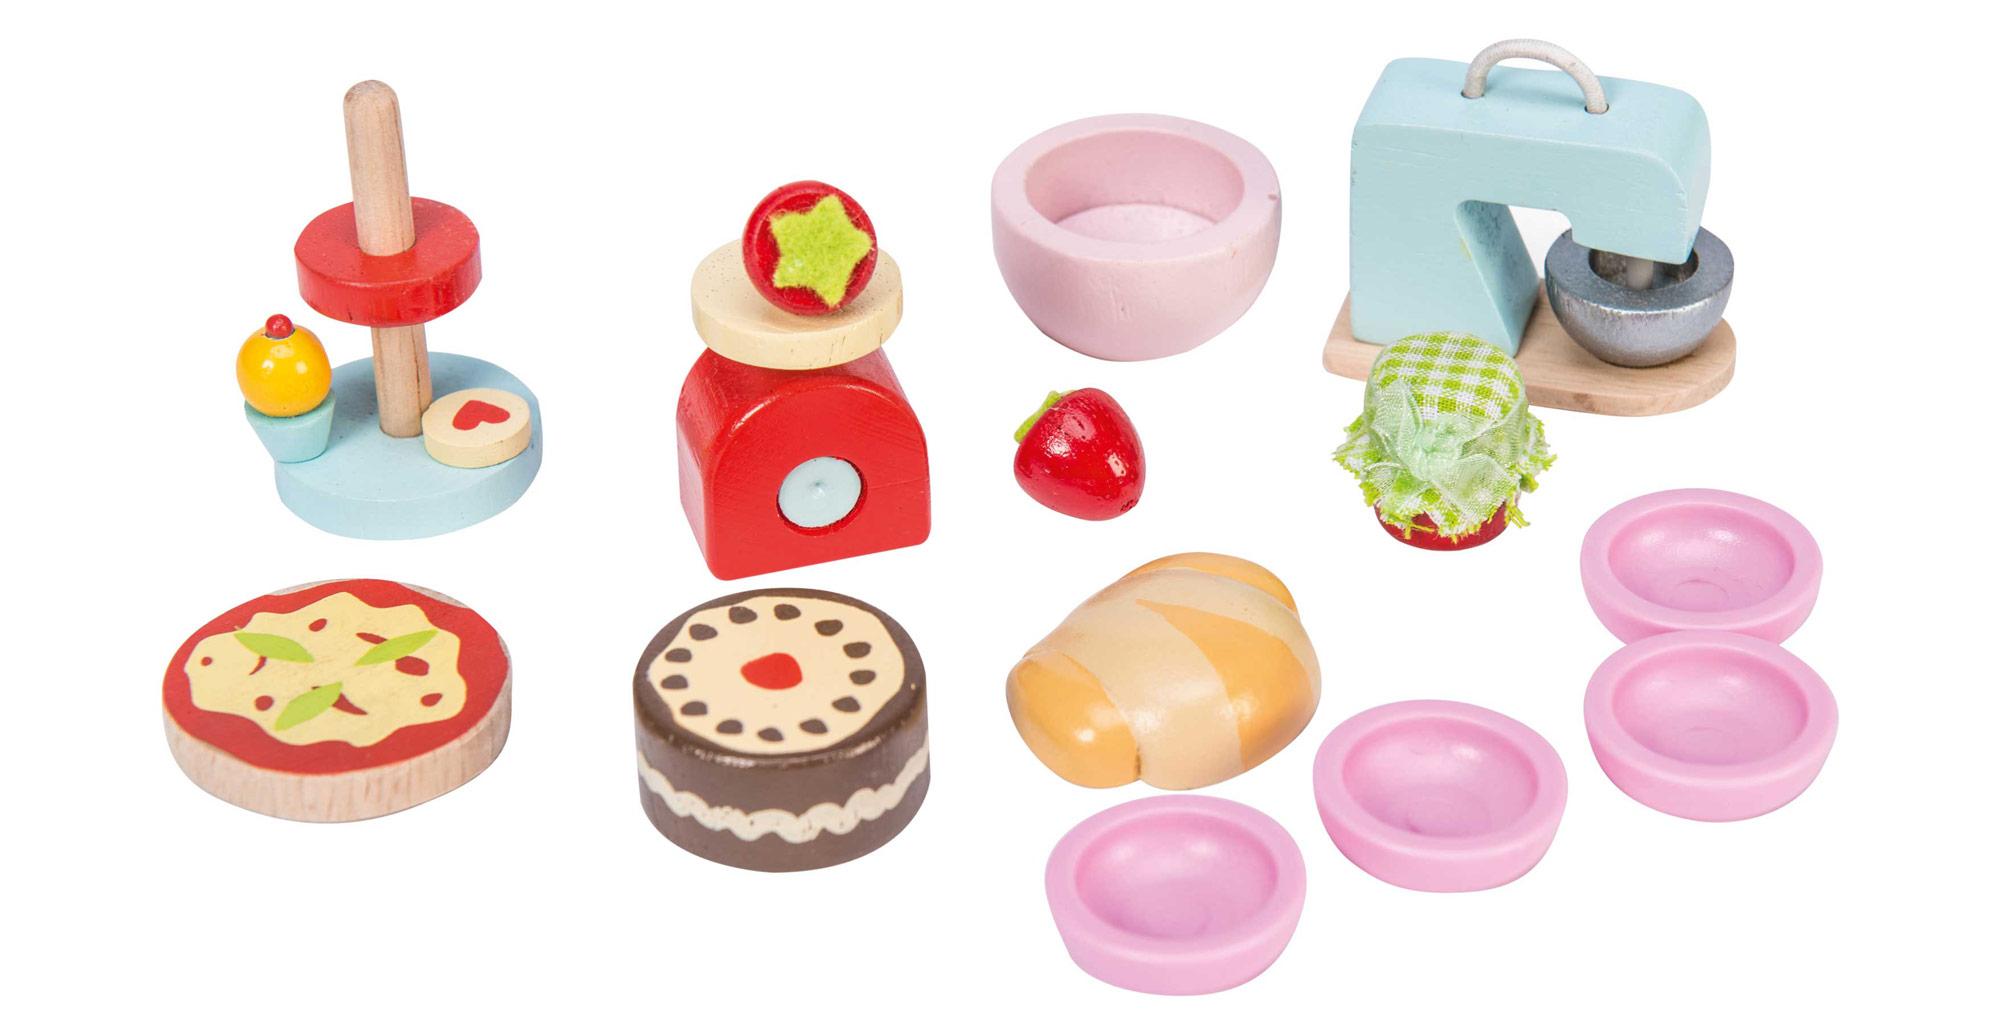 Baking clipart kitchen furniture Kitchen Accessories Make Bake Make